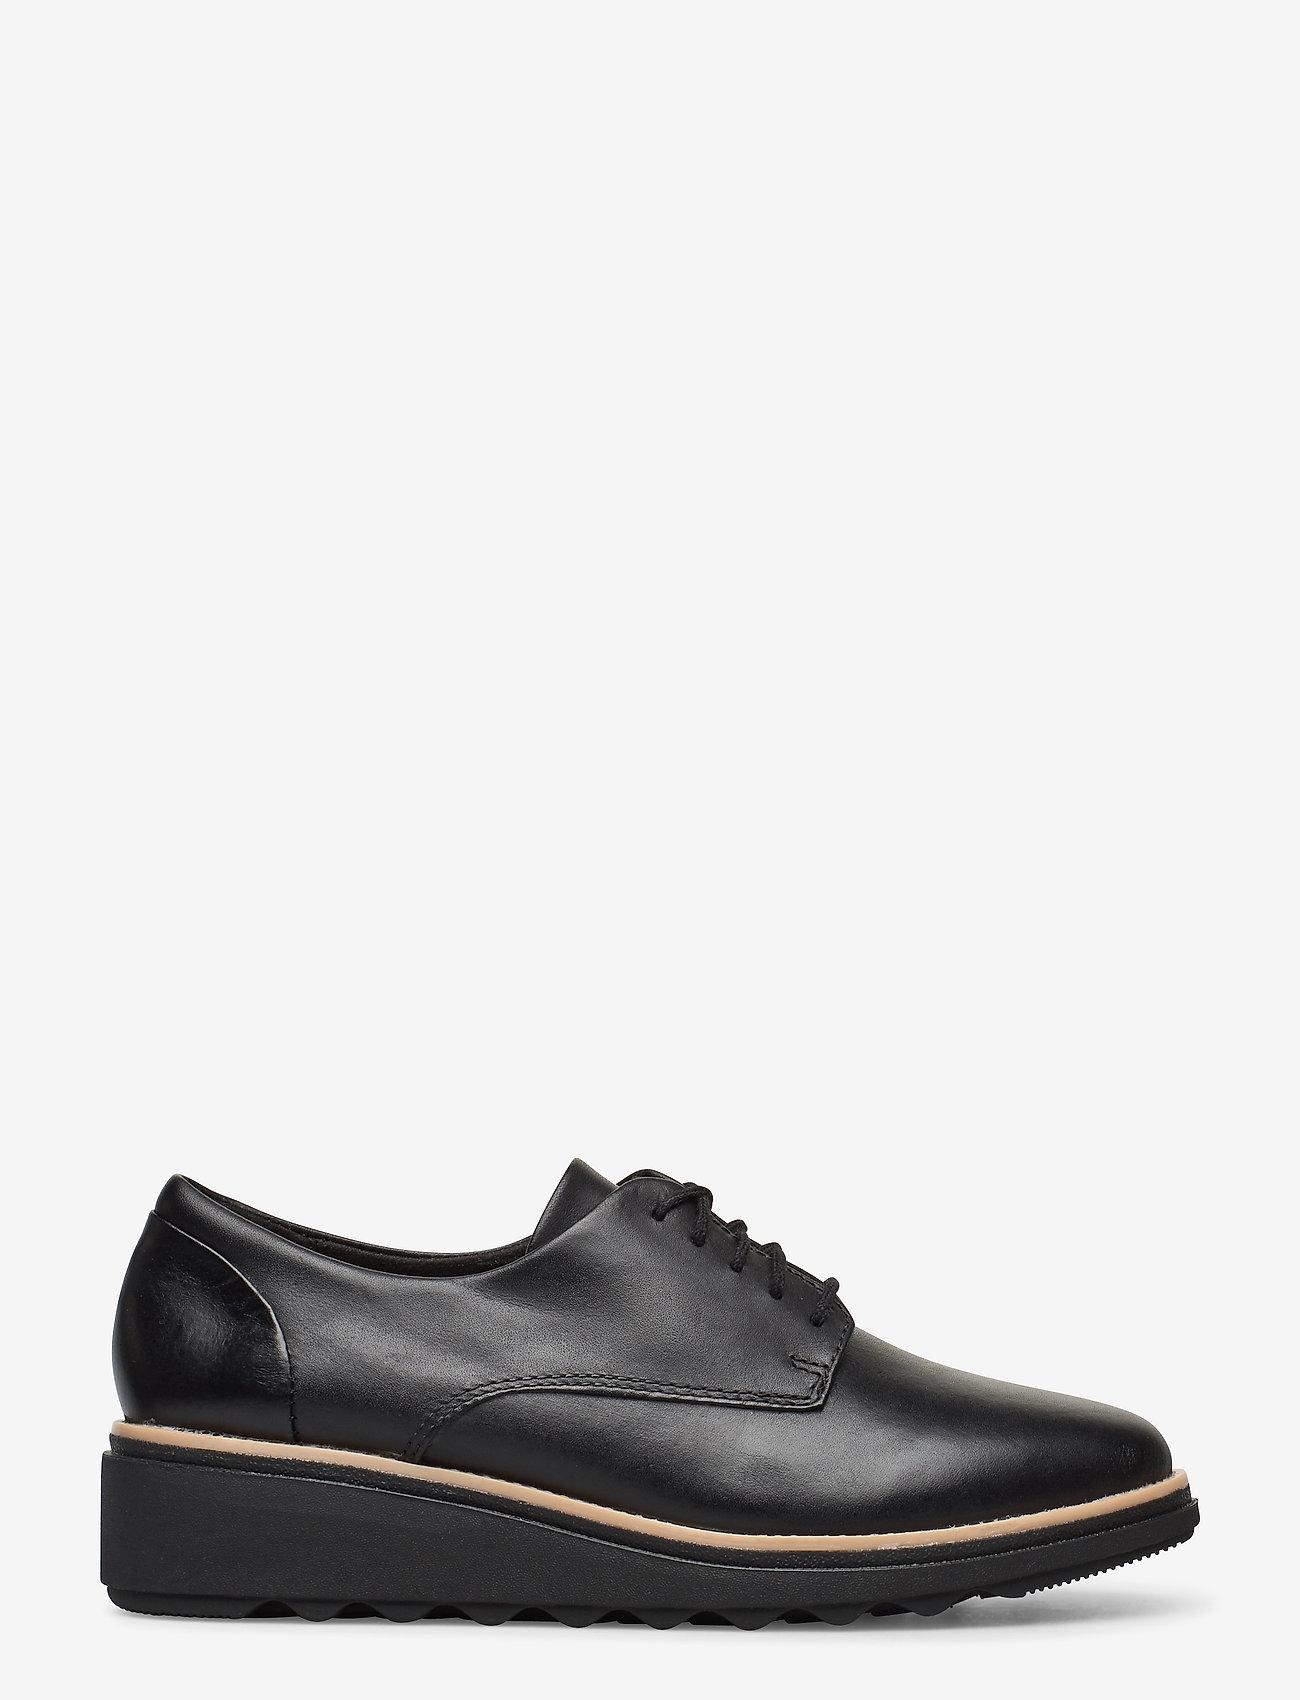 Clarks - Sharon Noel - buty sznurowane - black leather - 1